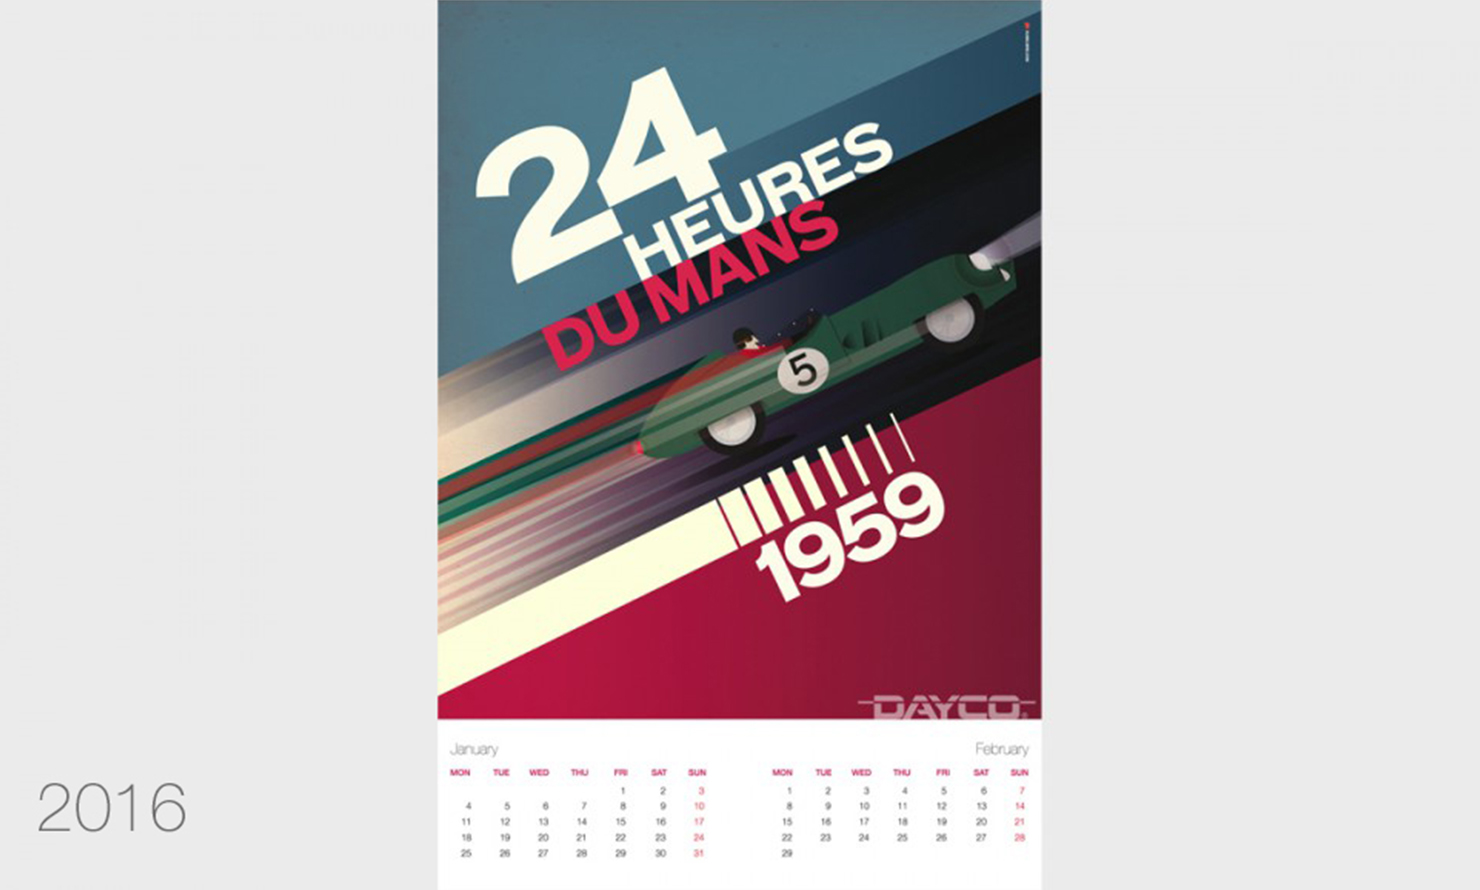 https://www.kubelibre.com/uploads/Slider-work-tutti-clienti/dayco-calendario-2016-1.jpg